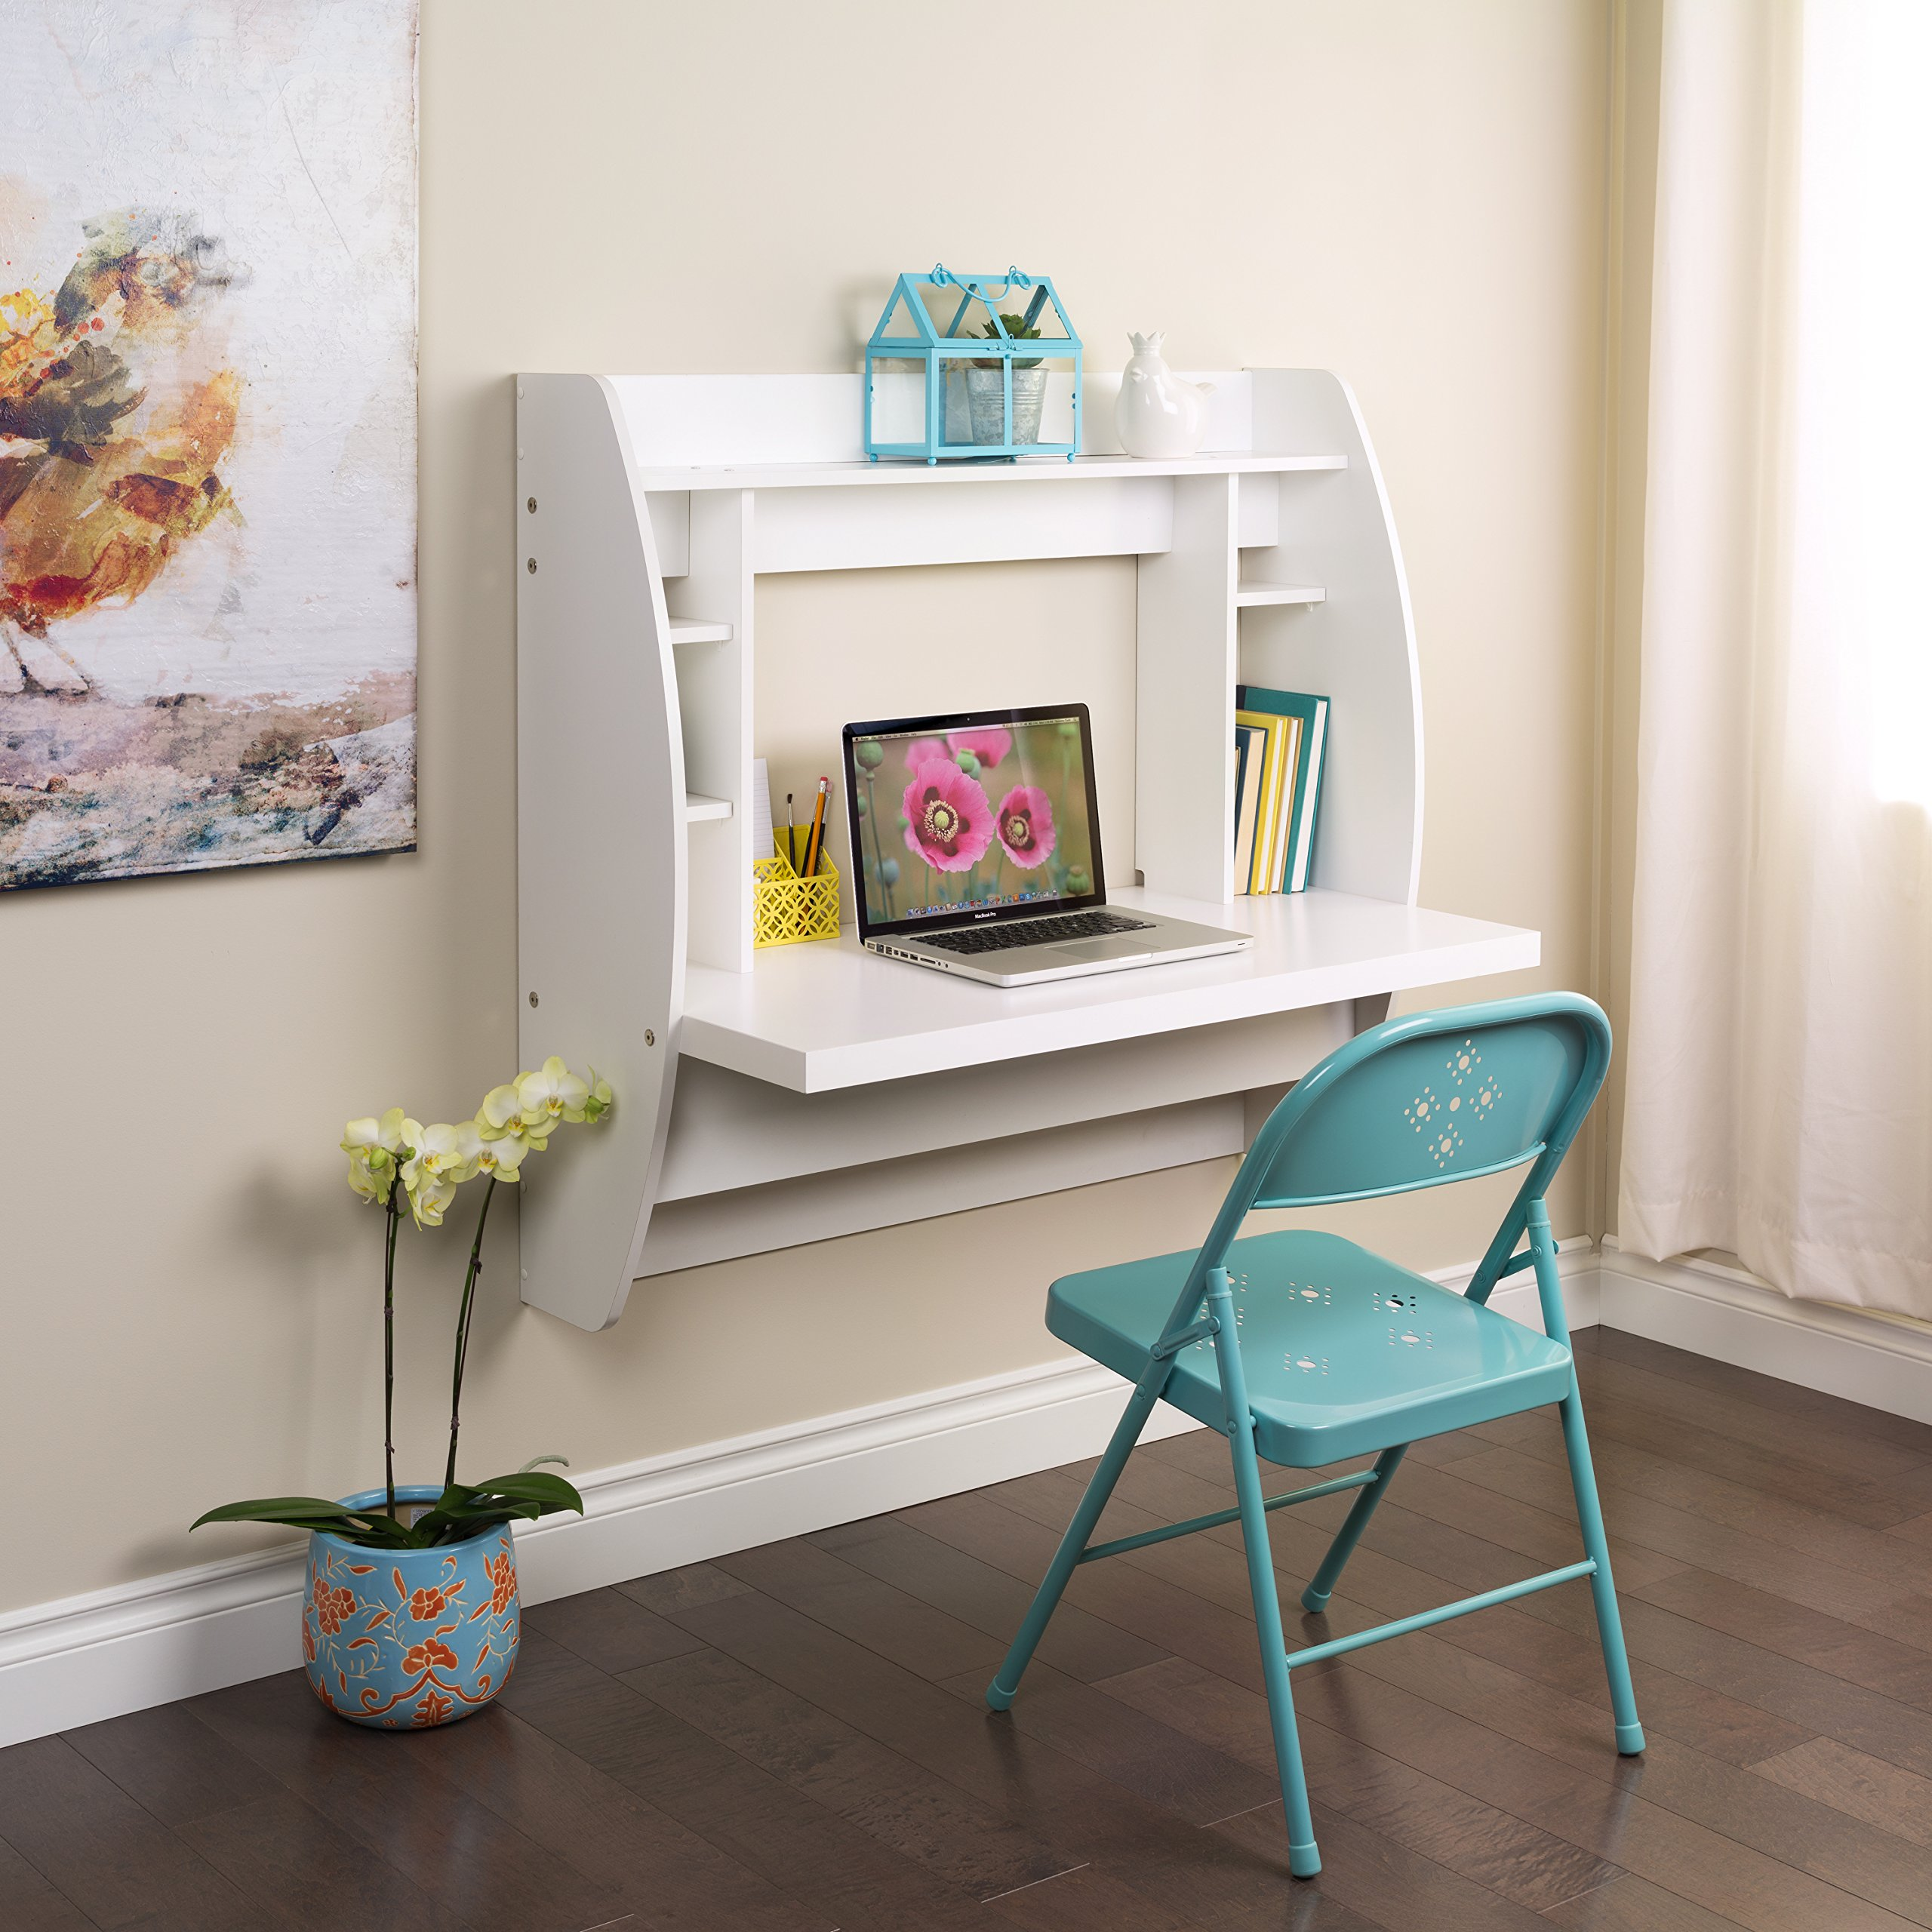 Prepac WEHW-0200-1 Floating Desk with Storage, White by Prepac